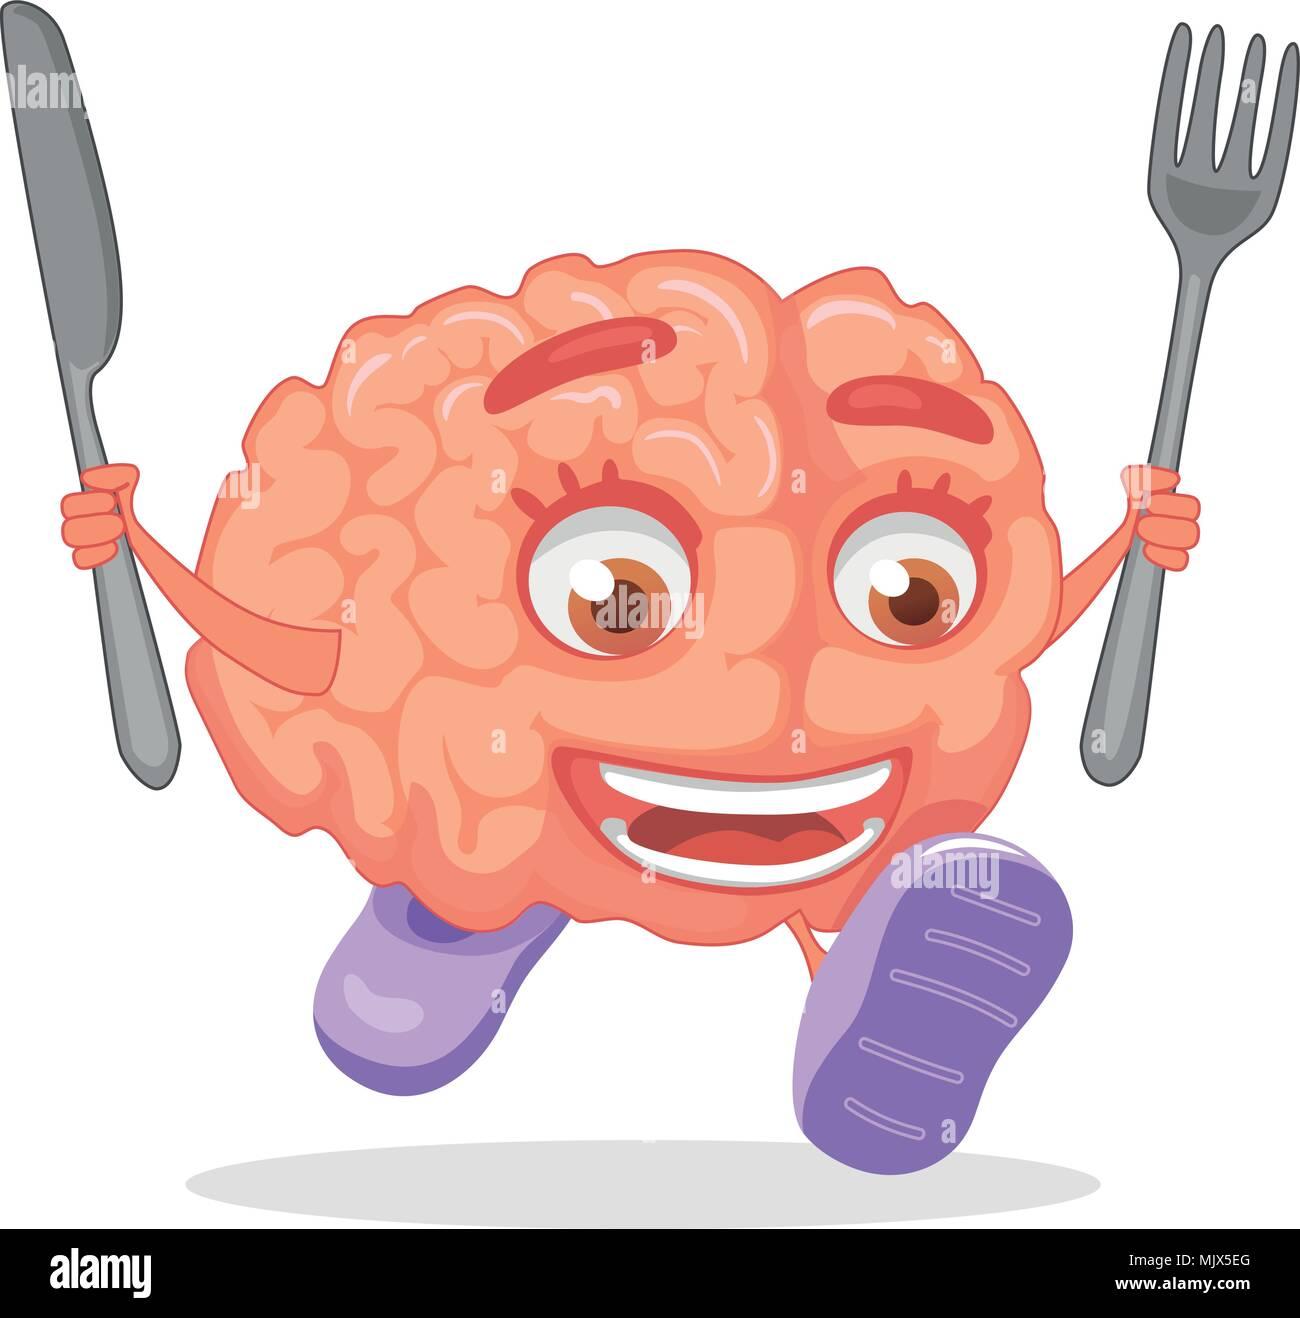 brain nutrition concept - Stock Image